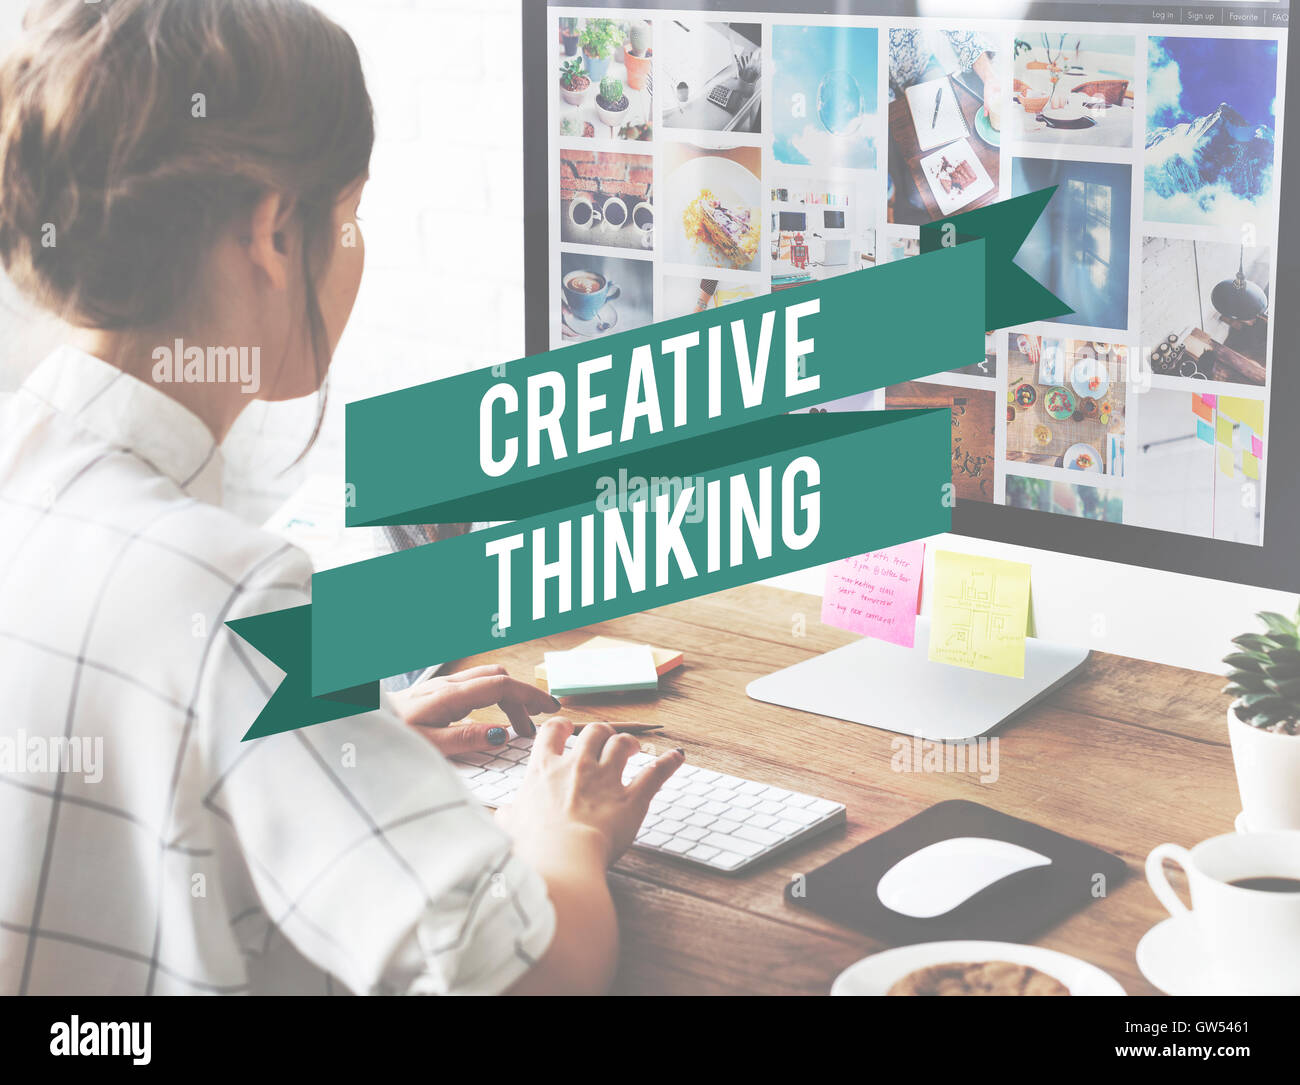 Blog Creativity Graphic Design Deadline Concept - Stock Image